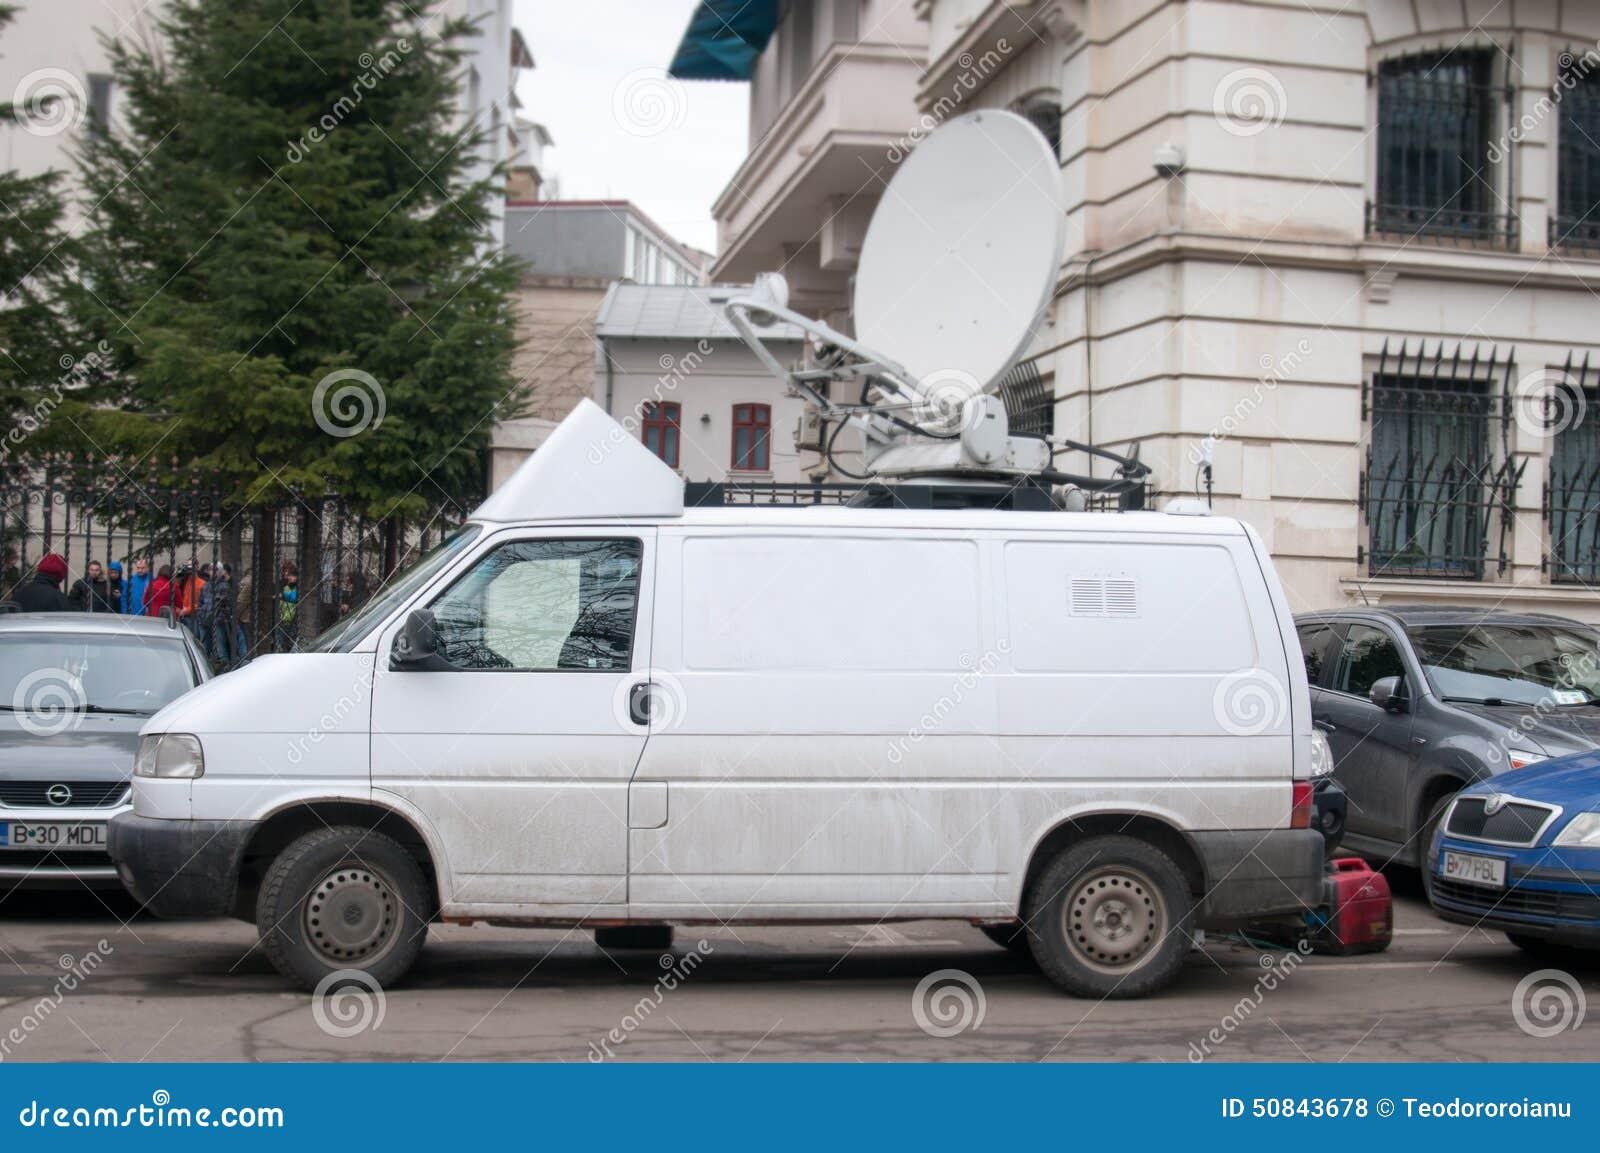 tv van editorial stock photo. image of transmitting, signal - 50843678